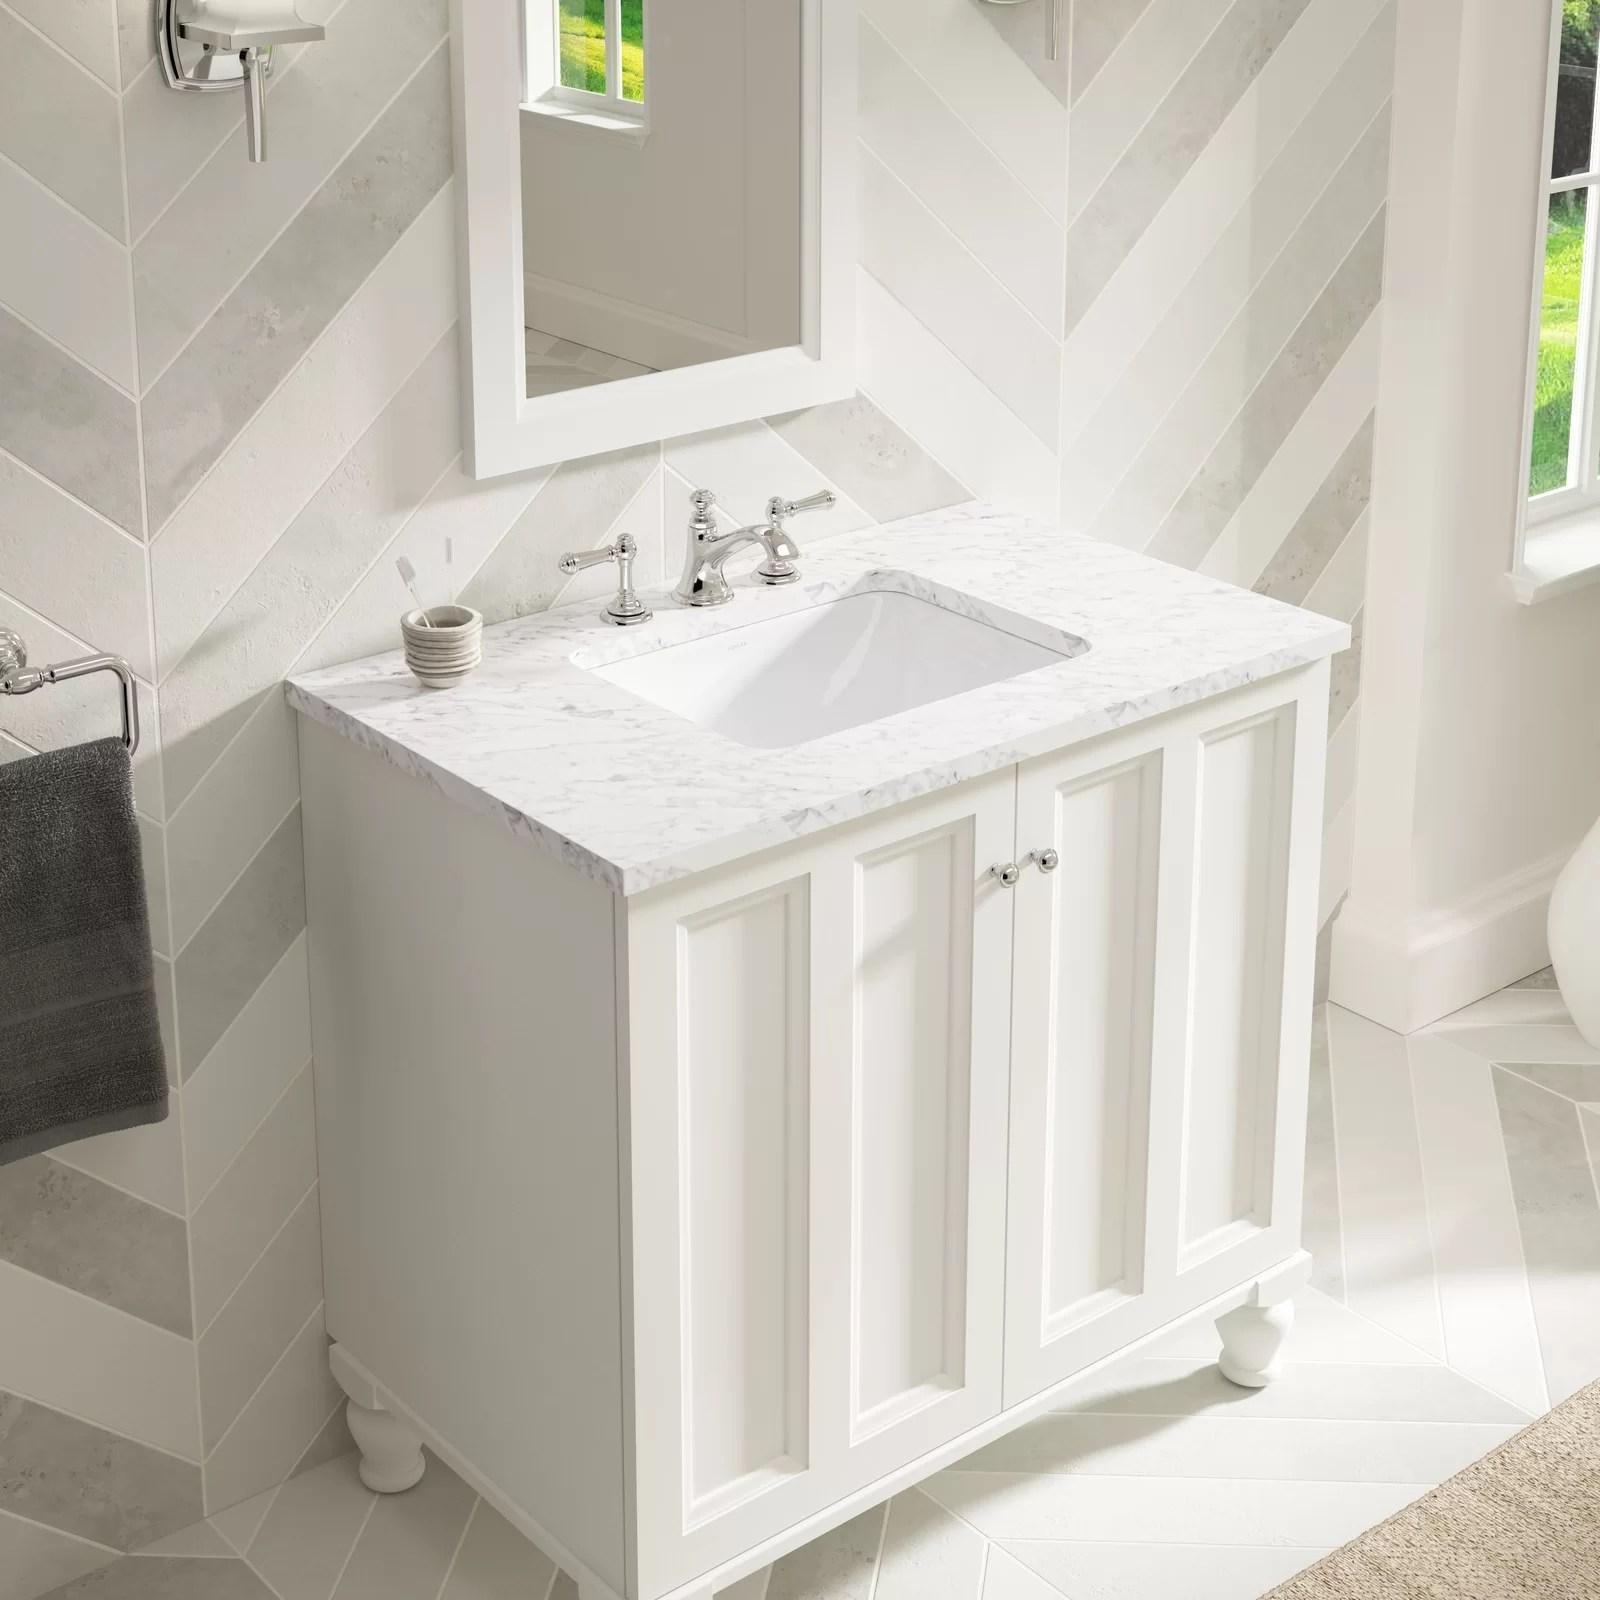 Kohler Caxton Rectangle Undermount Bathroom Sink with